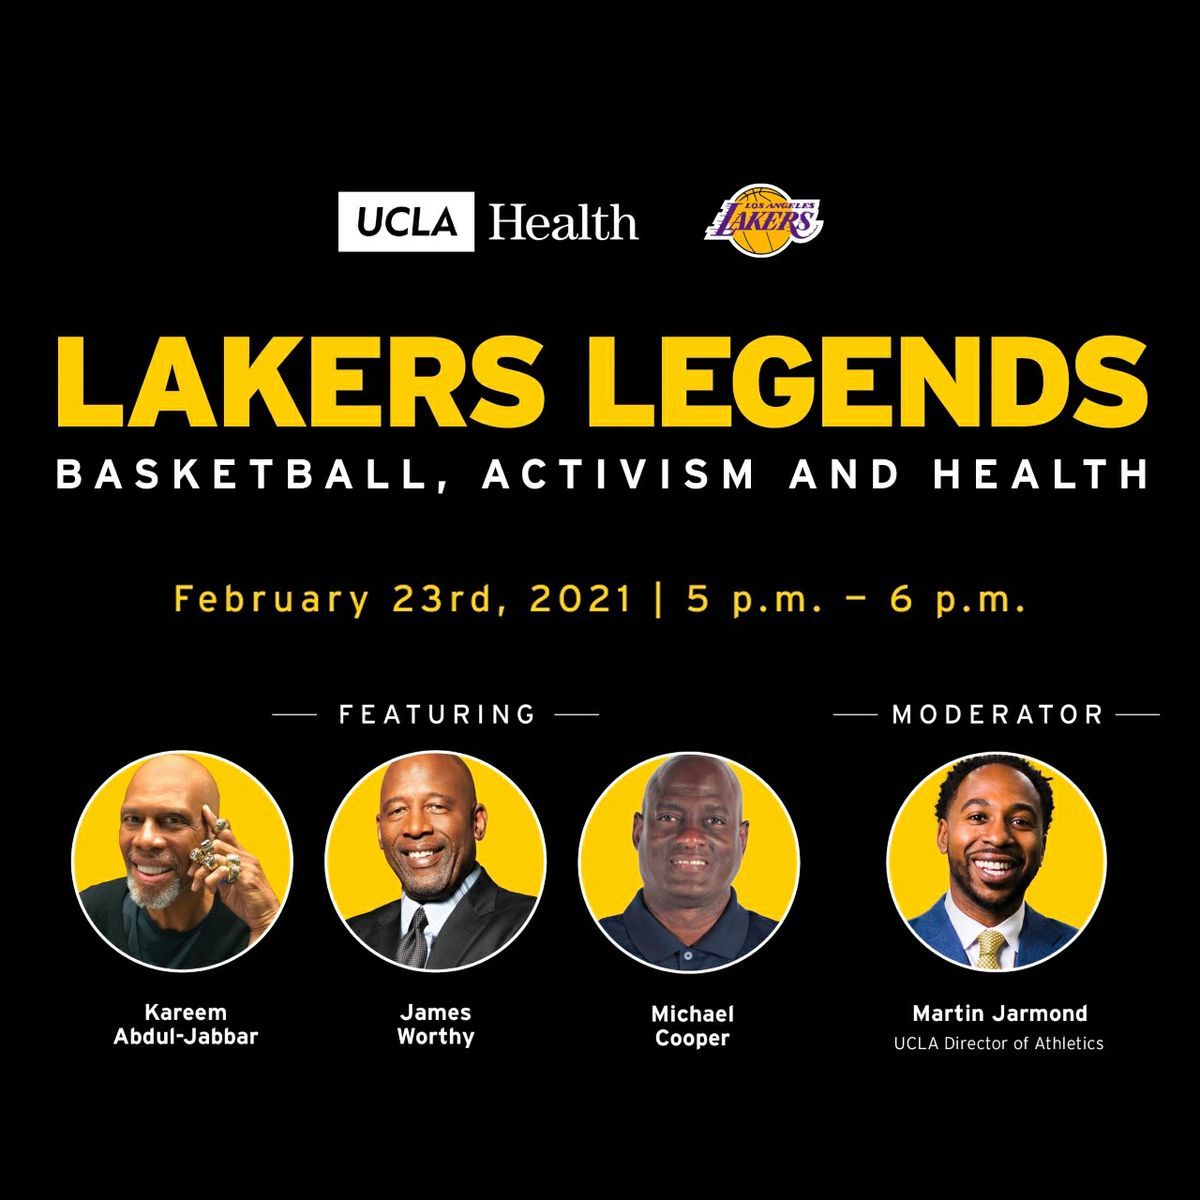 UCLAH - Lakers Legends - 1280x1280 revised copy